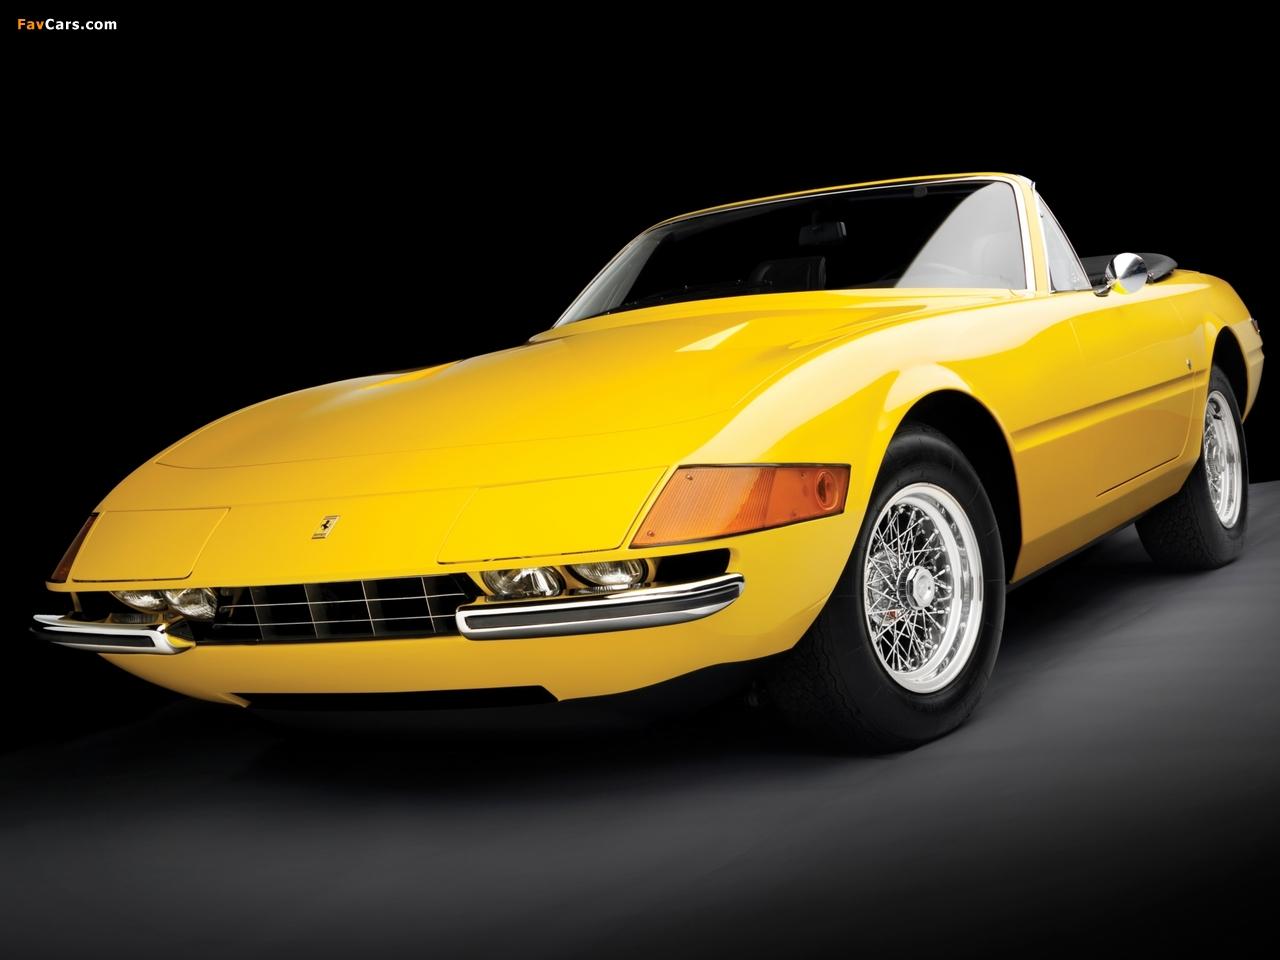 Ferrari 365 Gts 4 Daytona Spider 1970 74 Images 1280x960